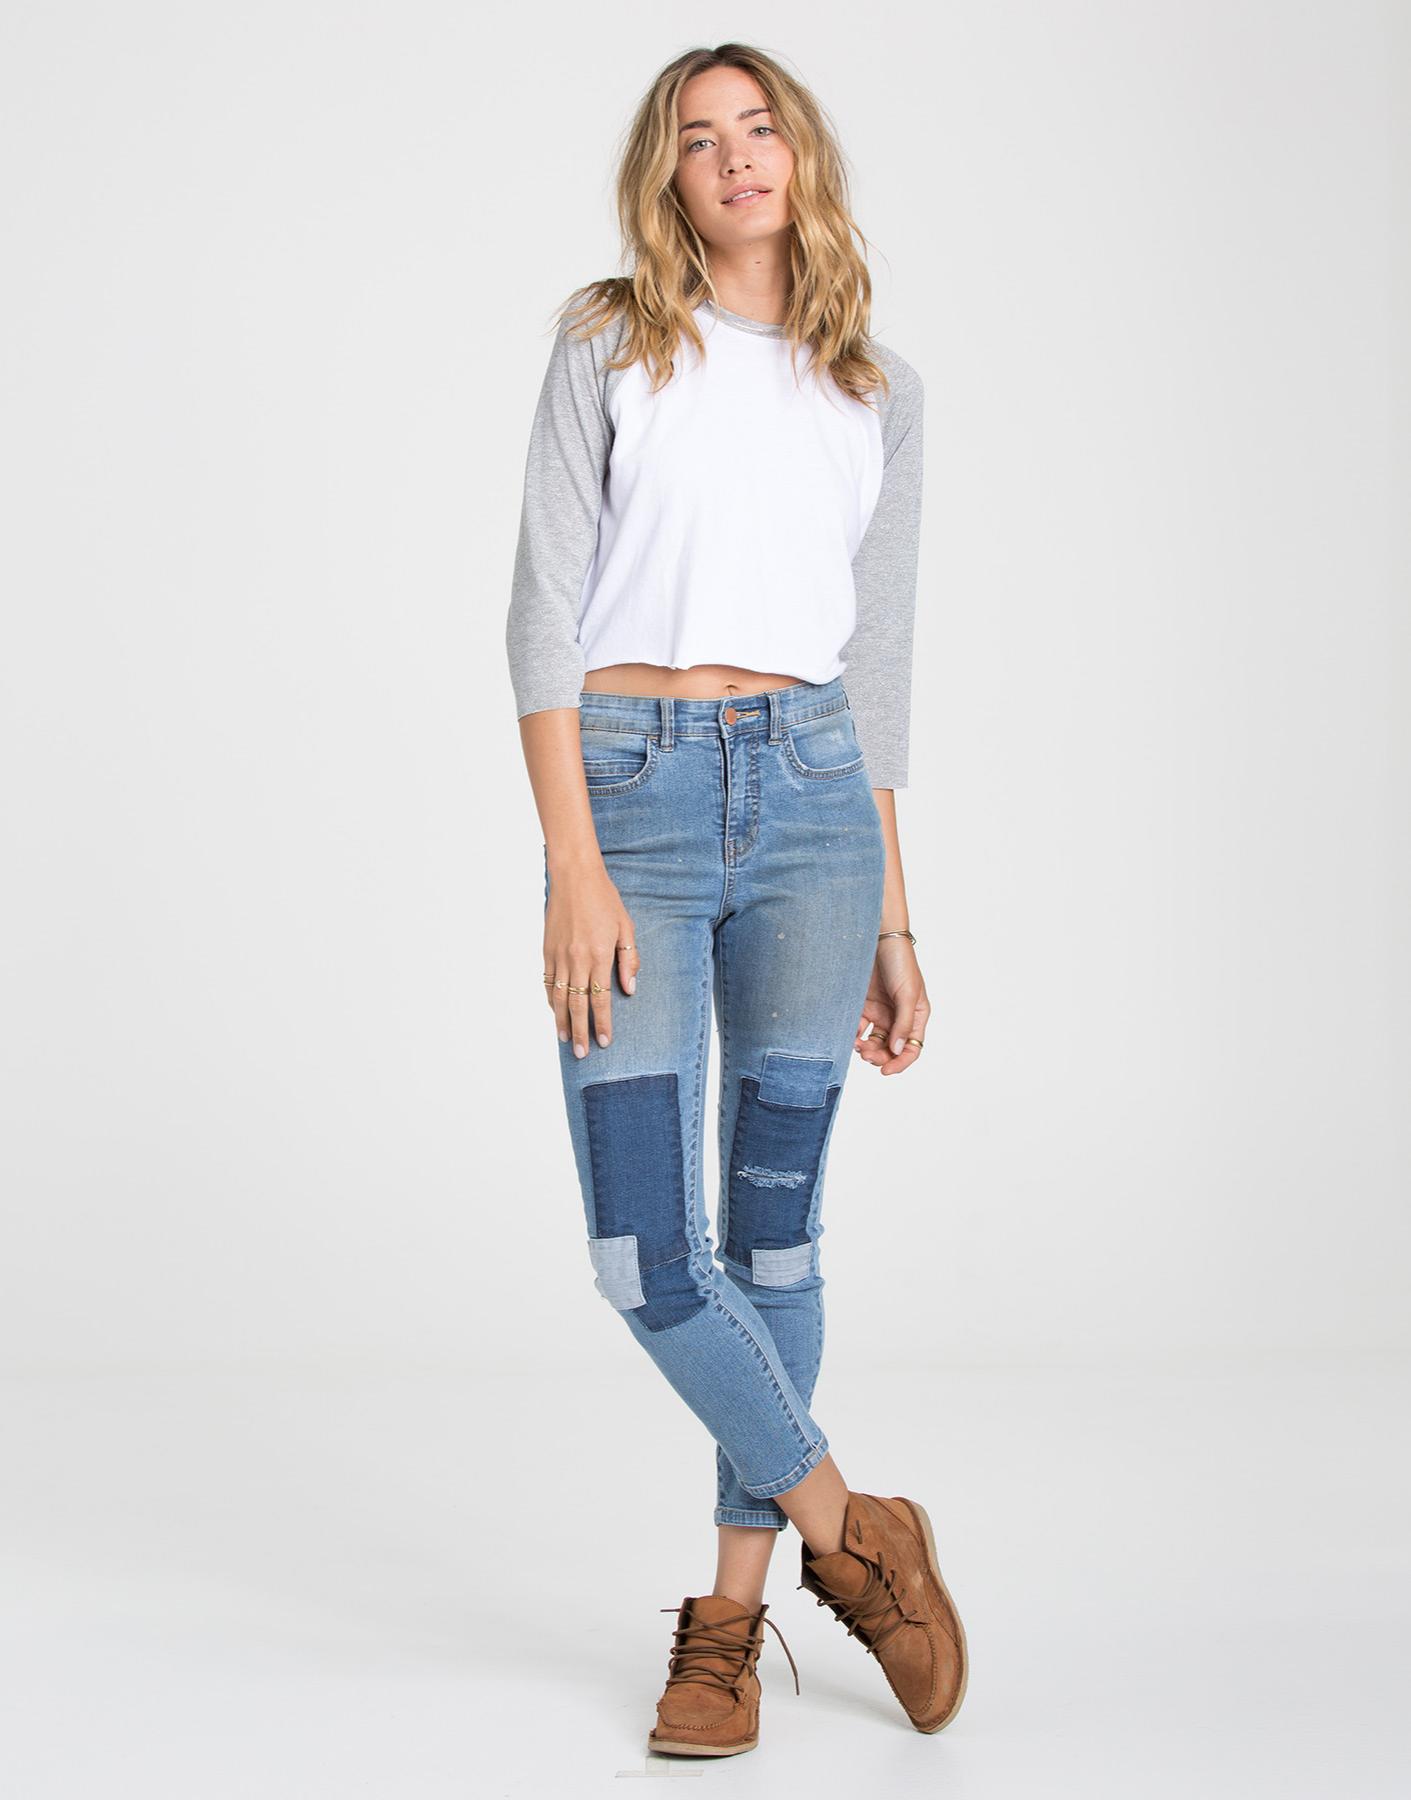 eff9cb35b9ad9 Fixed Up Hot Mama Jeans | Billabong US | b l u e s | Billabong women ...